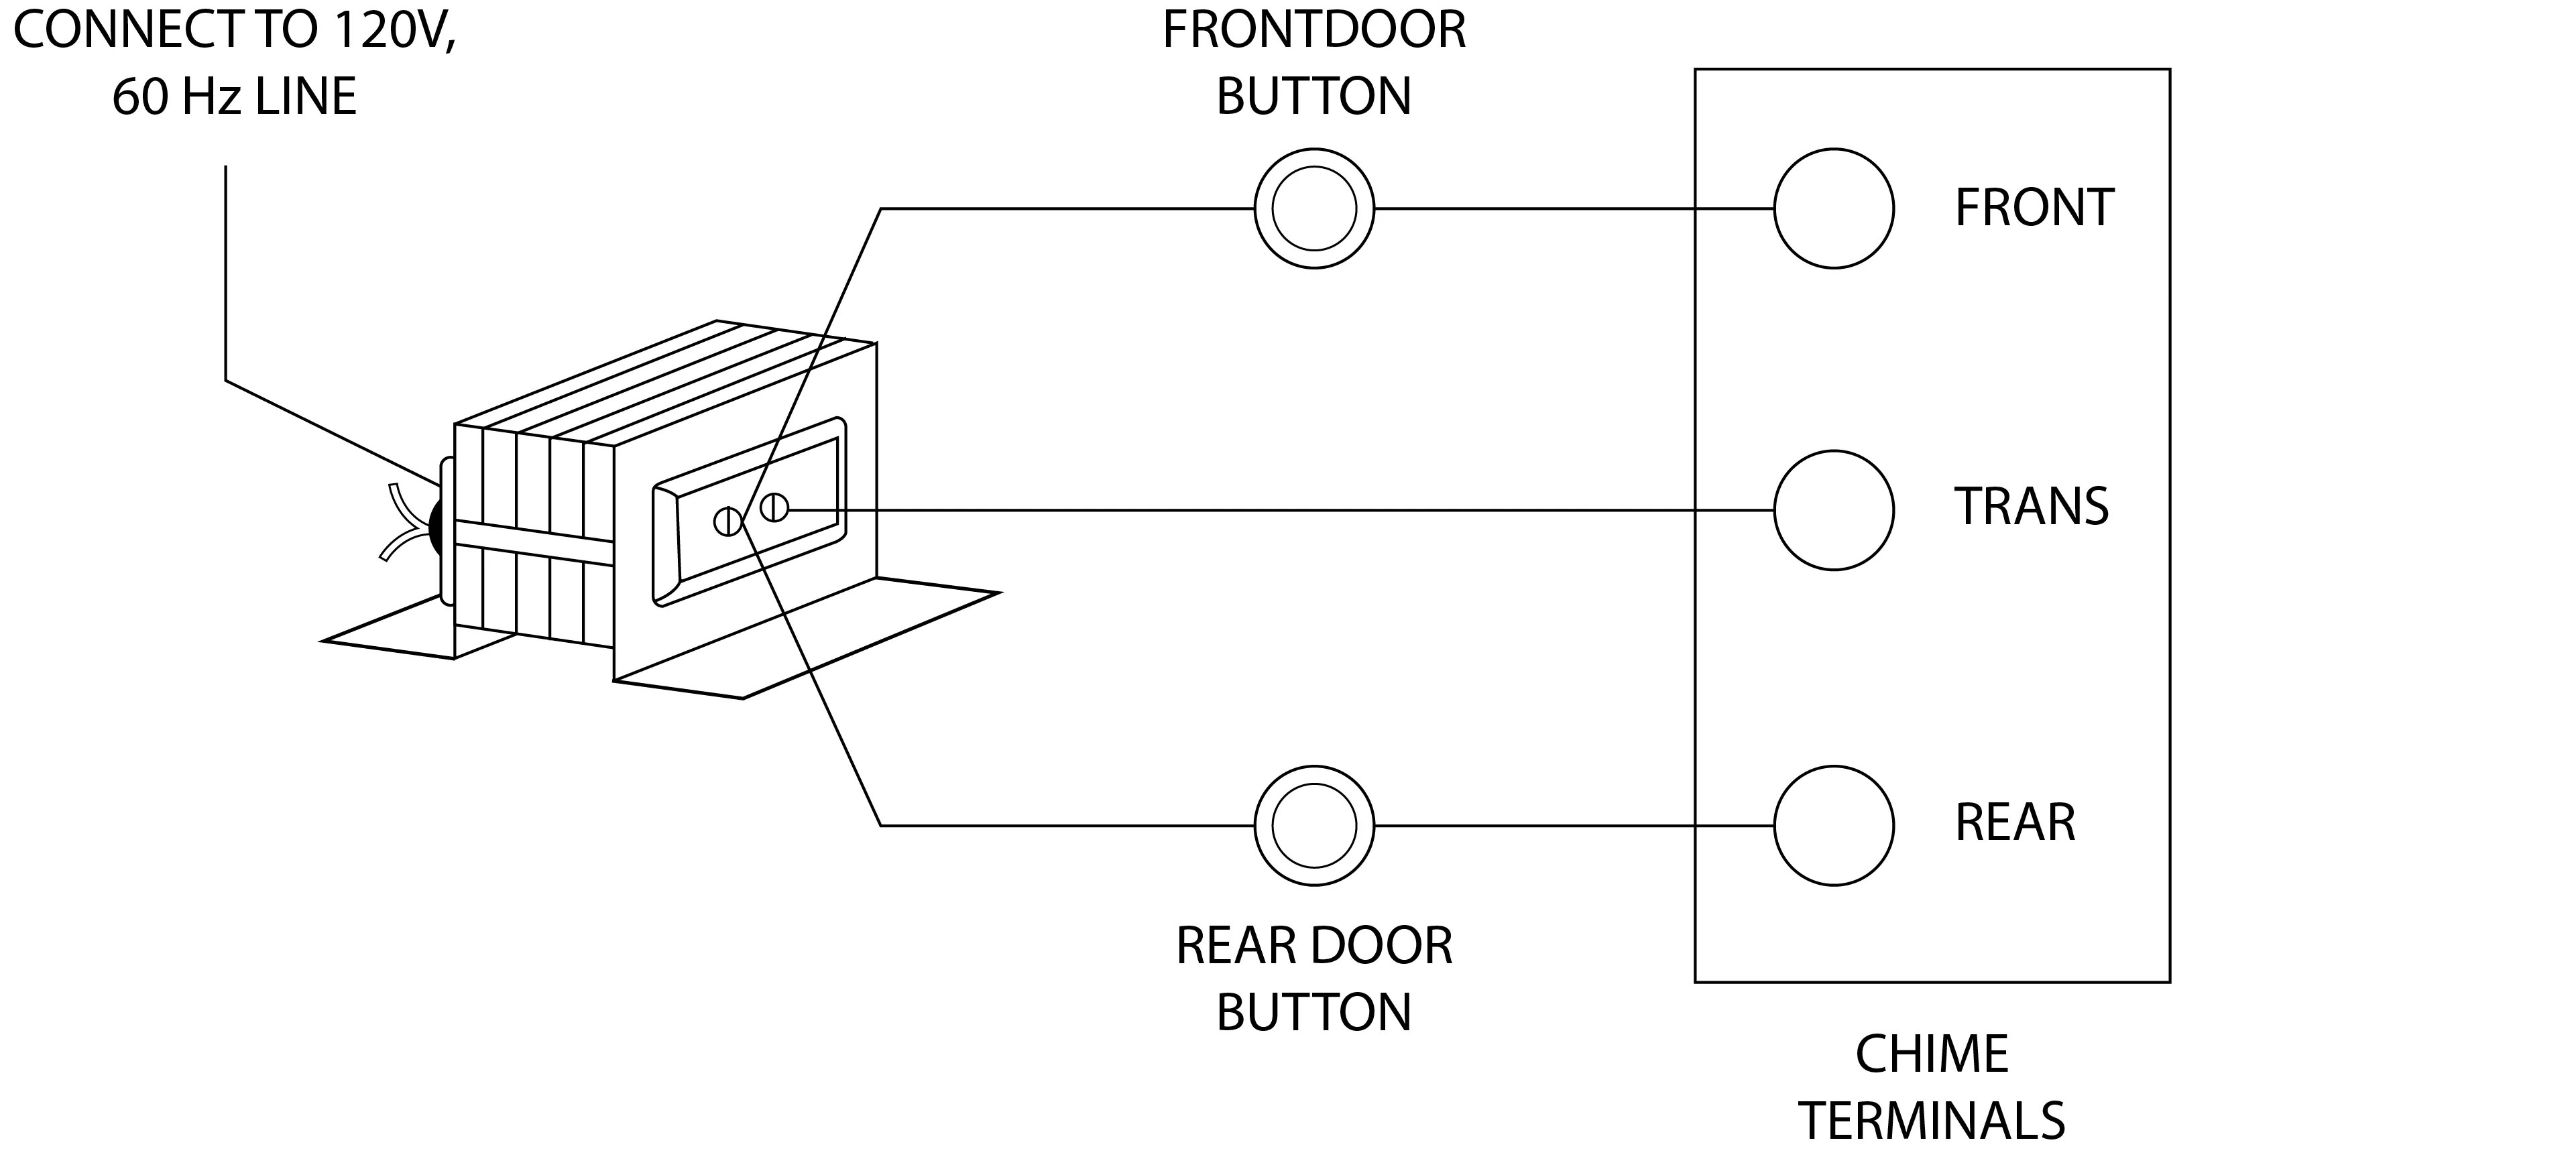 kenwood dnx9990hd wiring diagram kenwood dnx6990hd wiring